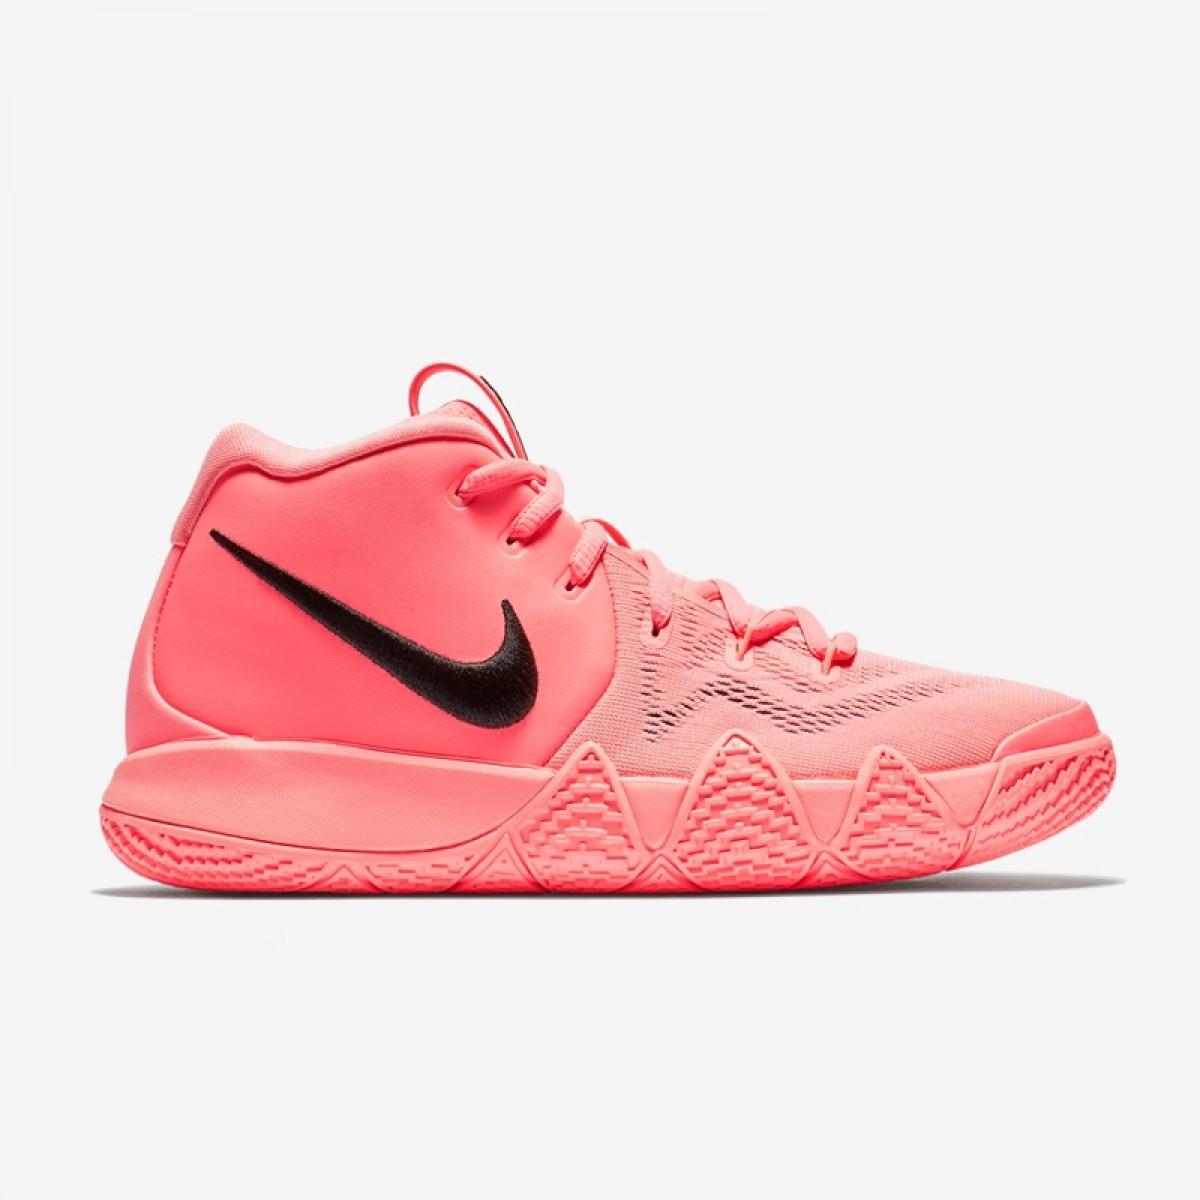 Nike Kyrie 4 GS 'Atomic Pink'